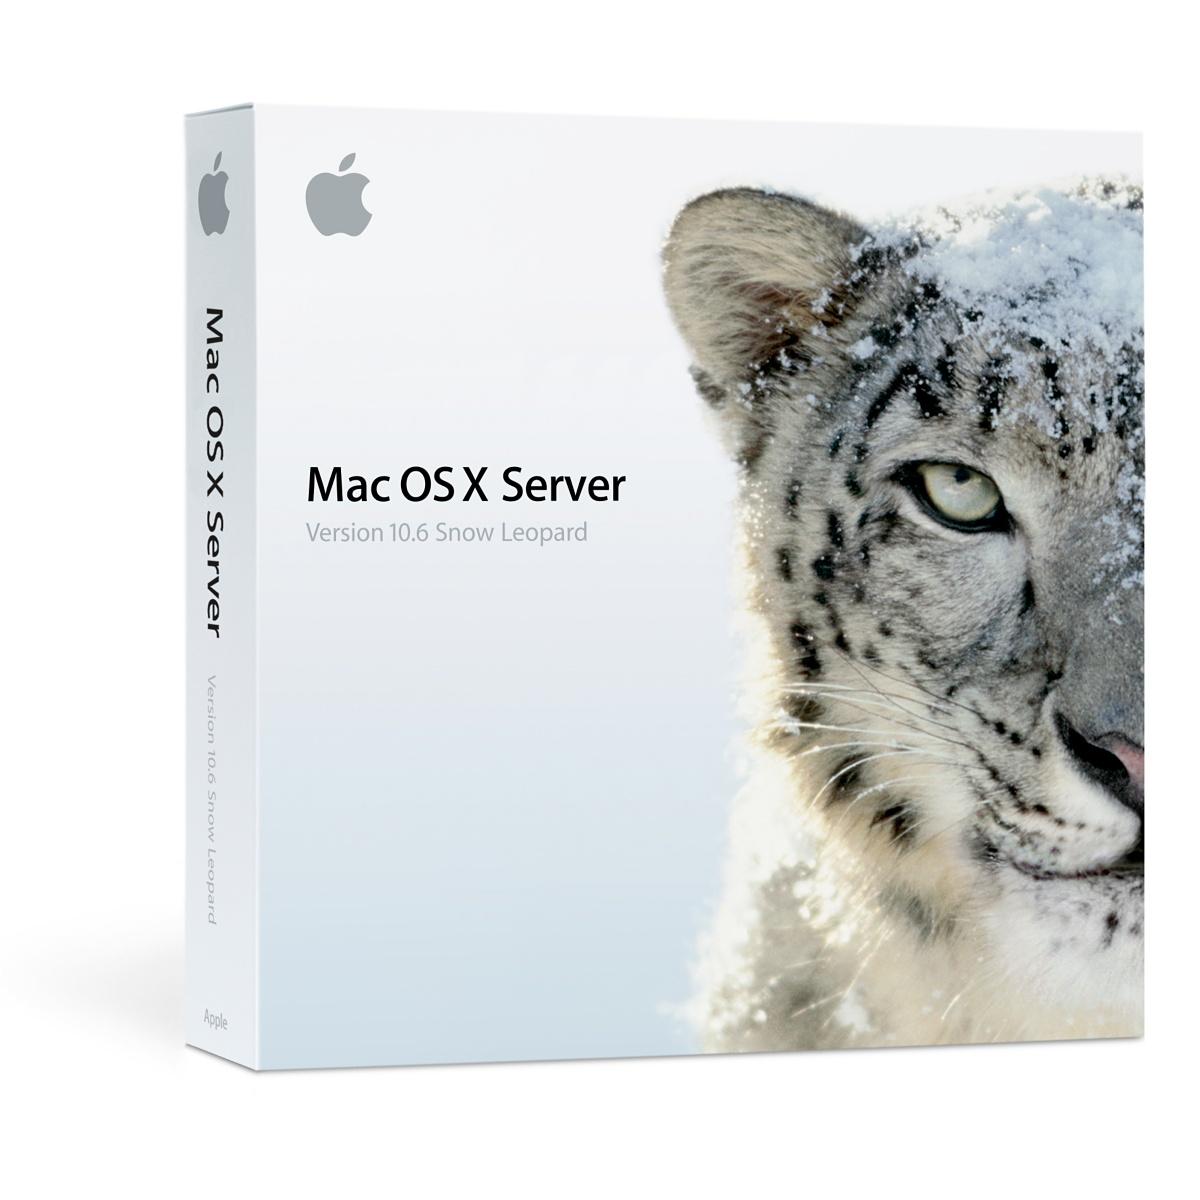 Mac OS X Server Snow Leopard